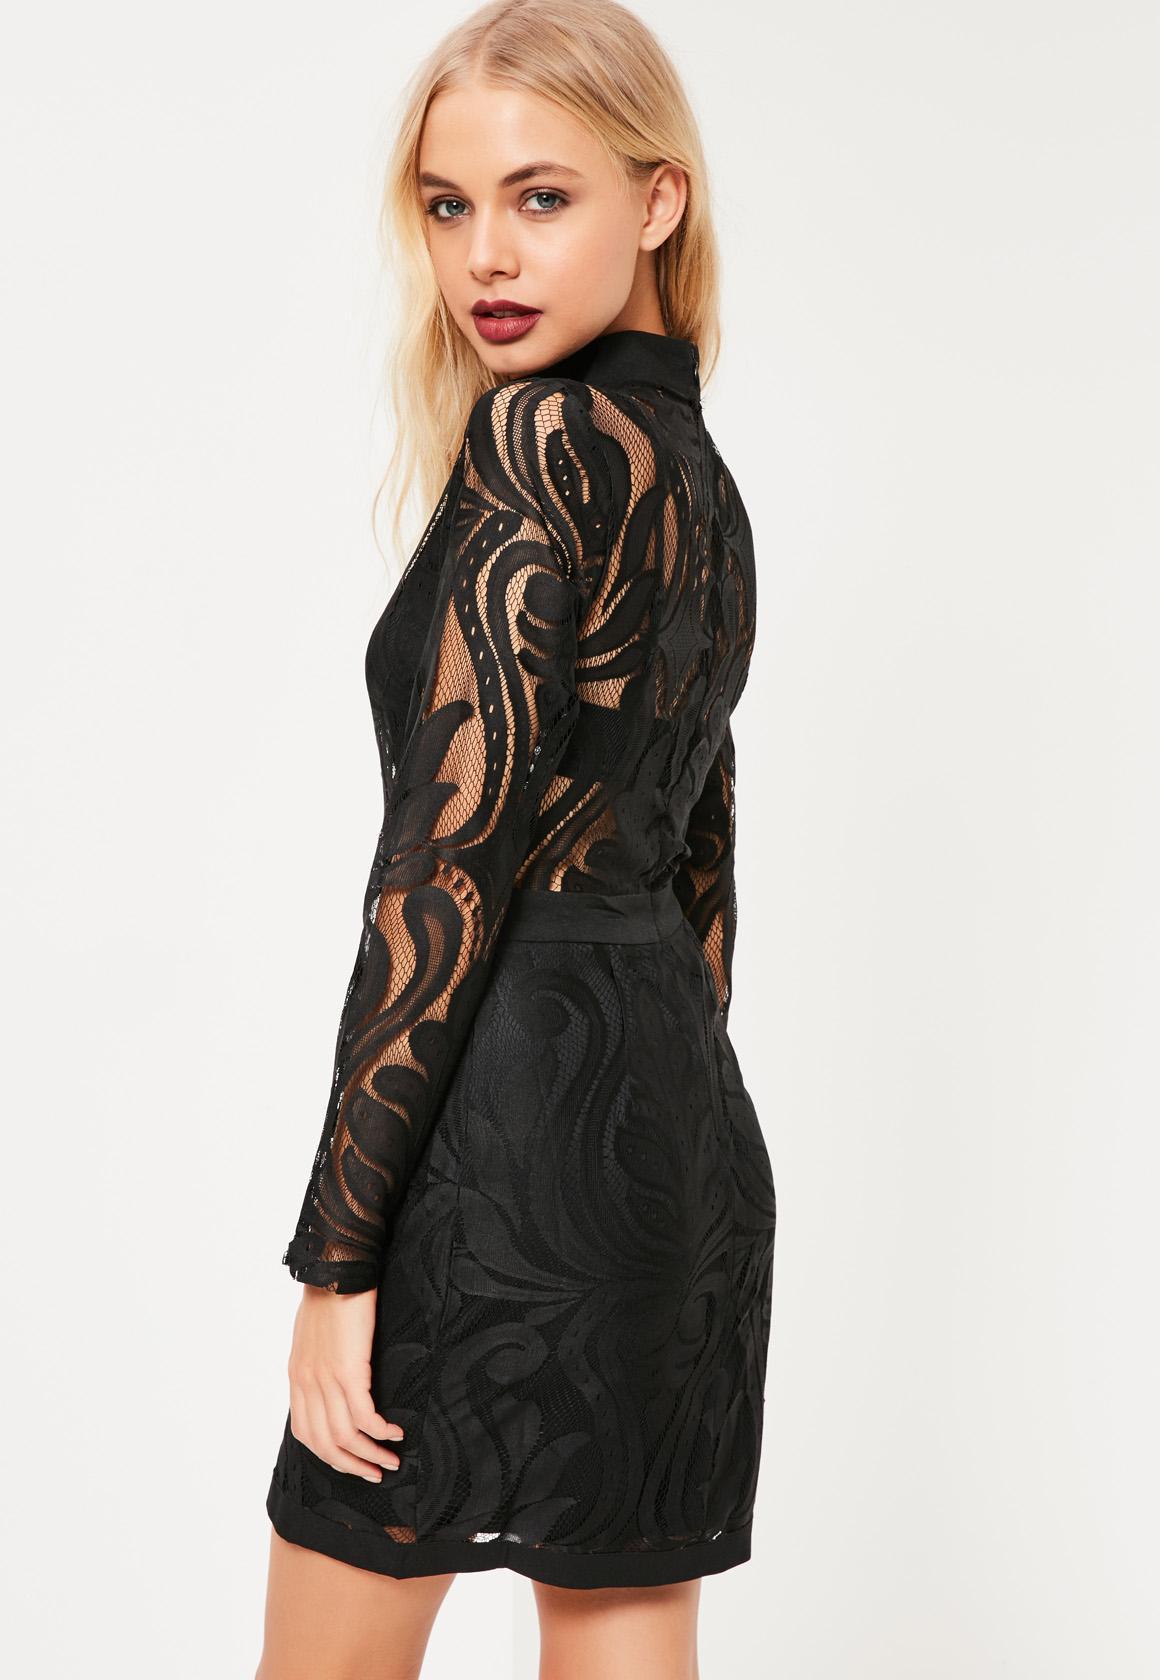 Black Lace Top Bodycon Dress